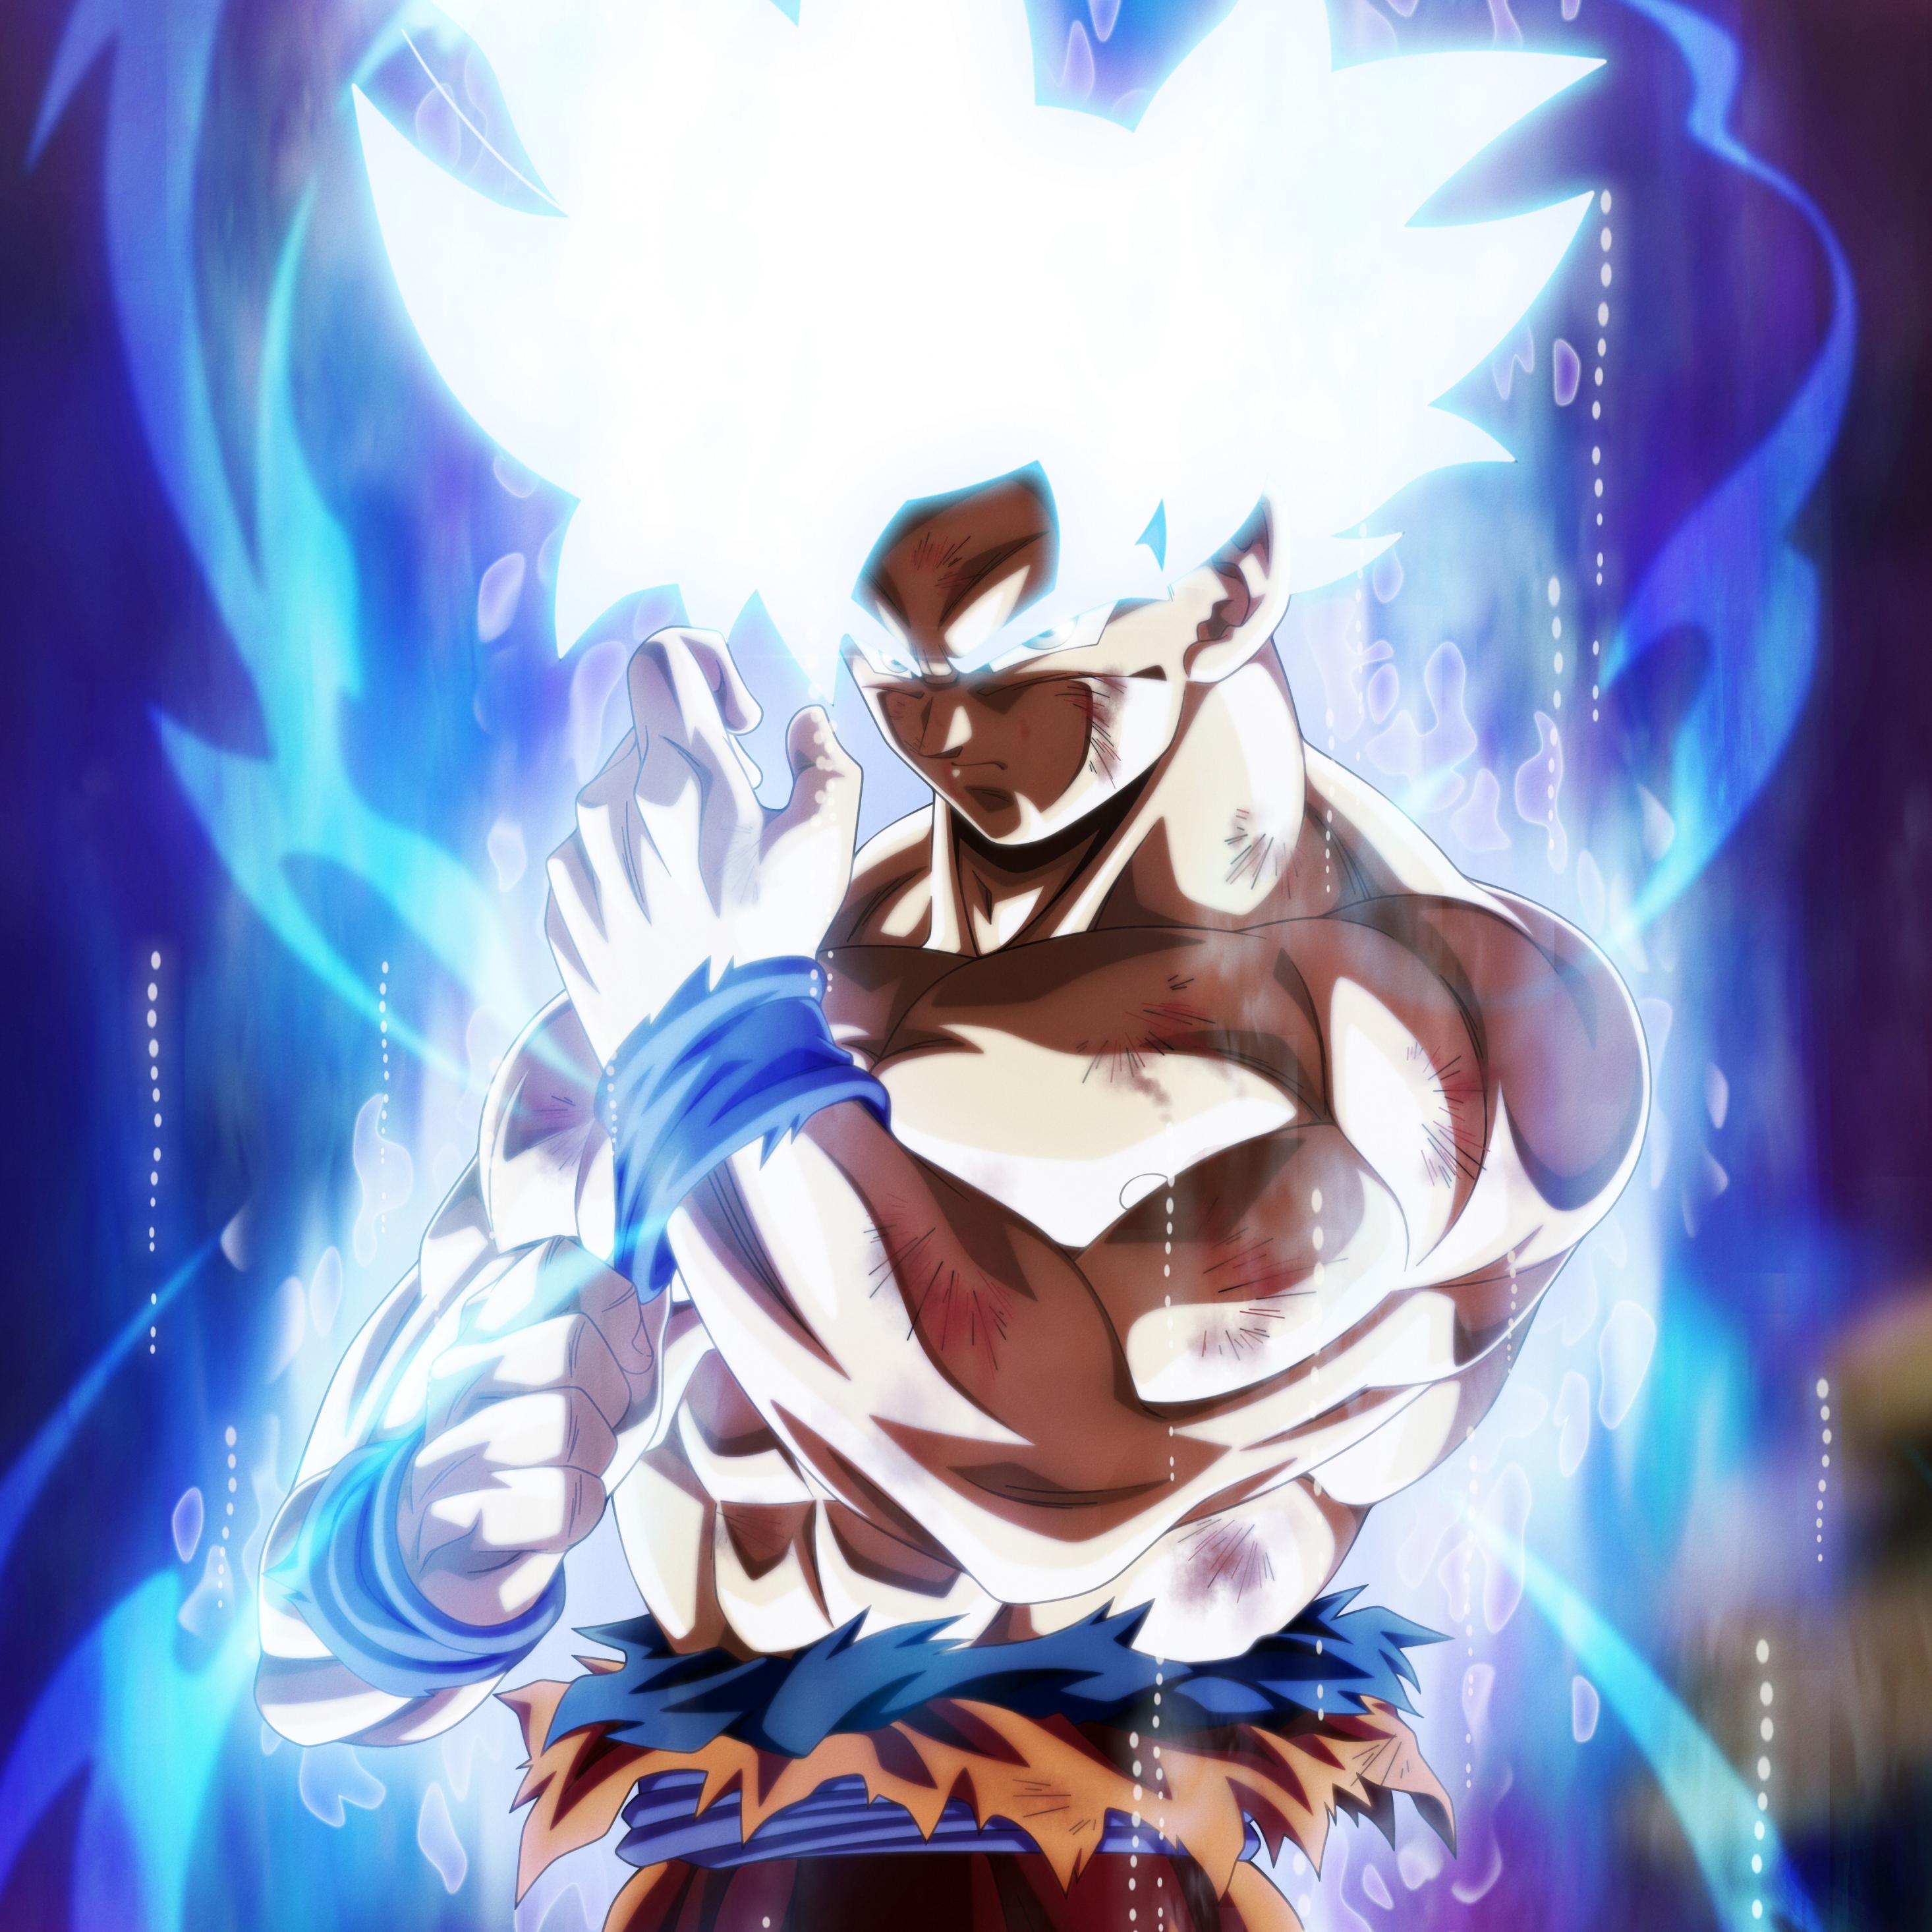 Dragon Ball Super Wallpaper 1080p Full Size: Download 2932x2932 Wallpaper Goku, Dragon Ball Super, Fan